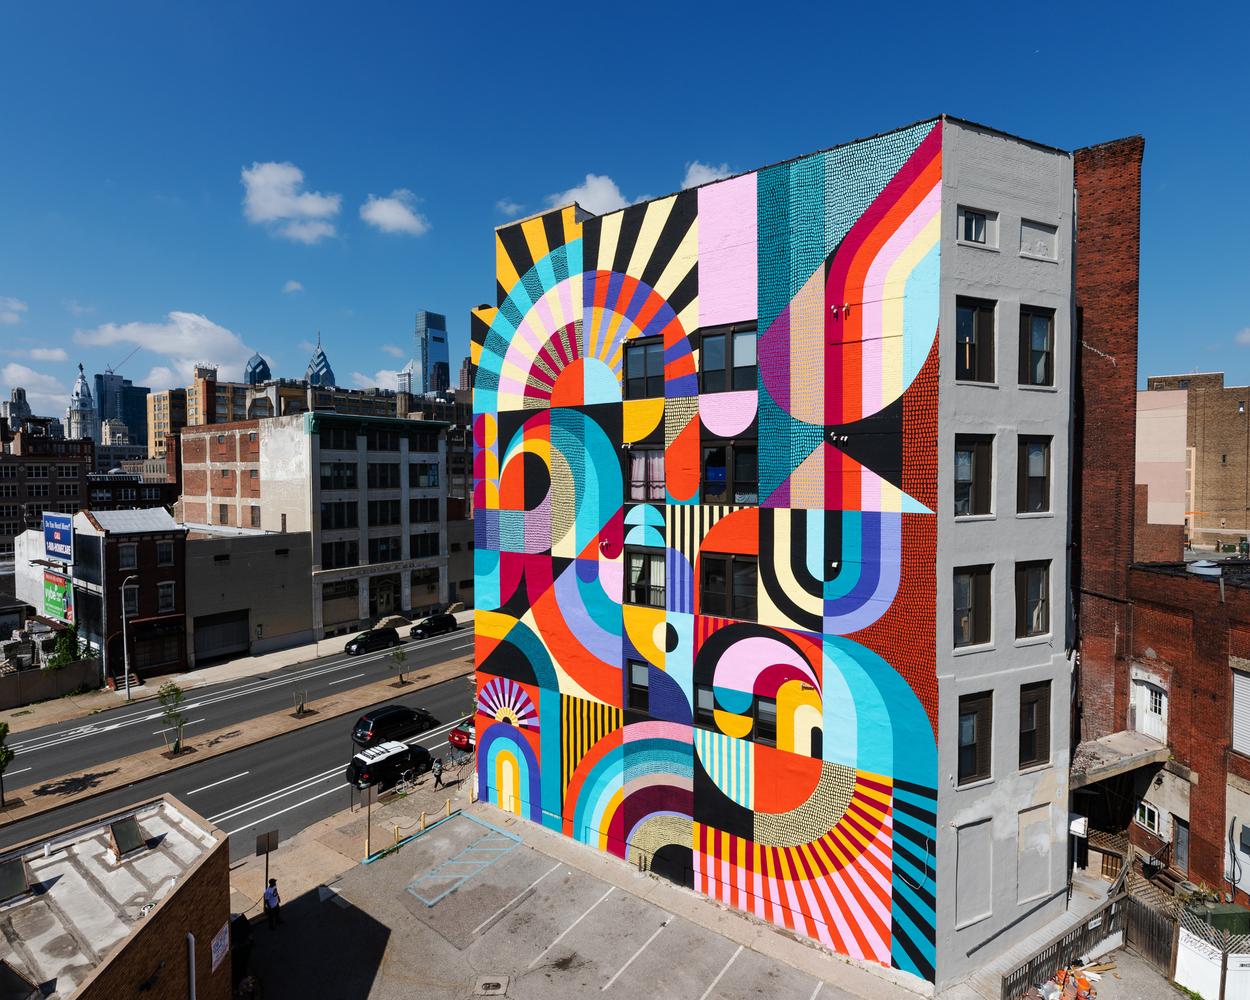 A Pop of Color on Public Spaces